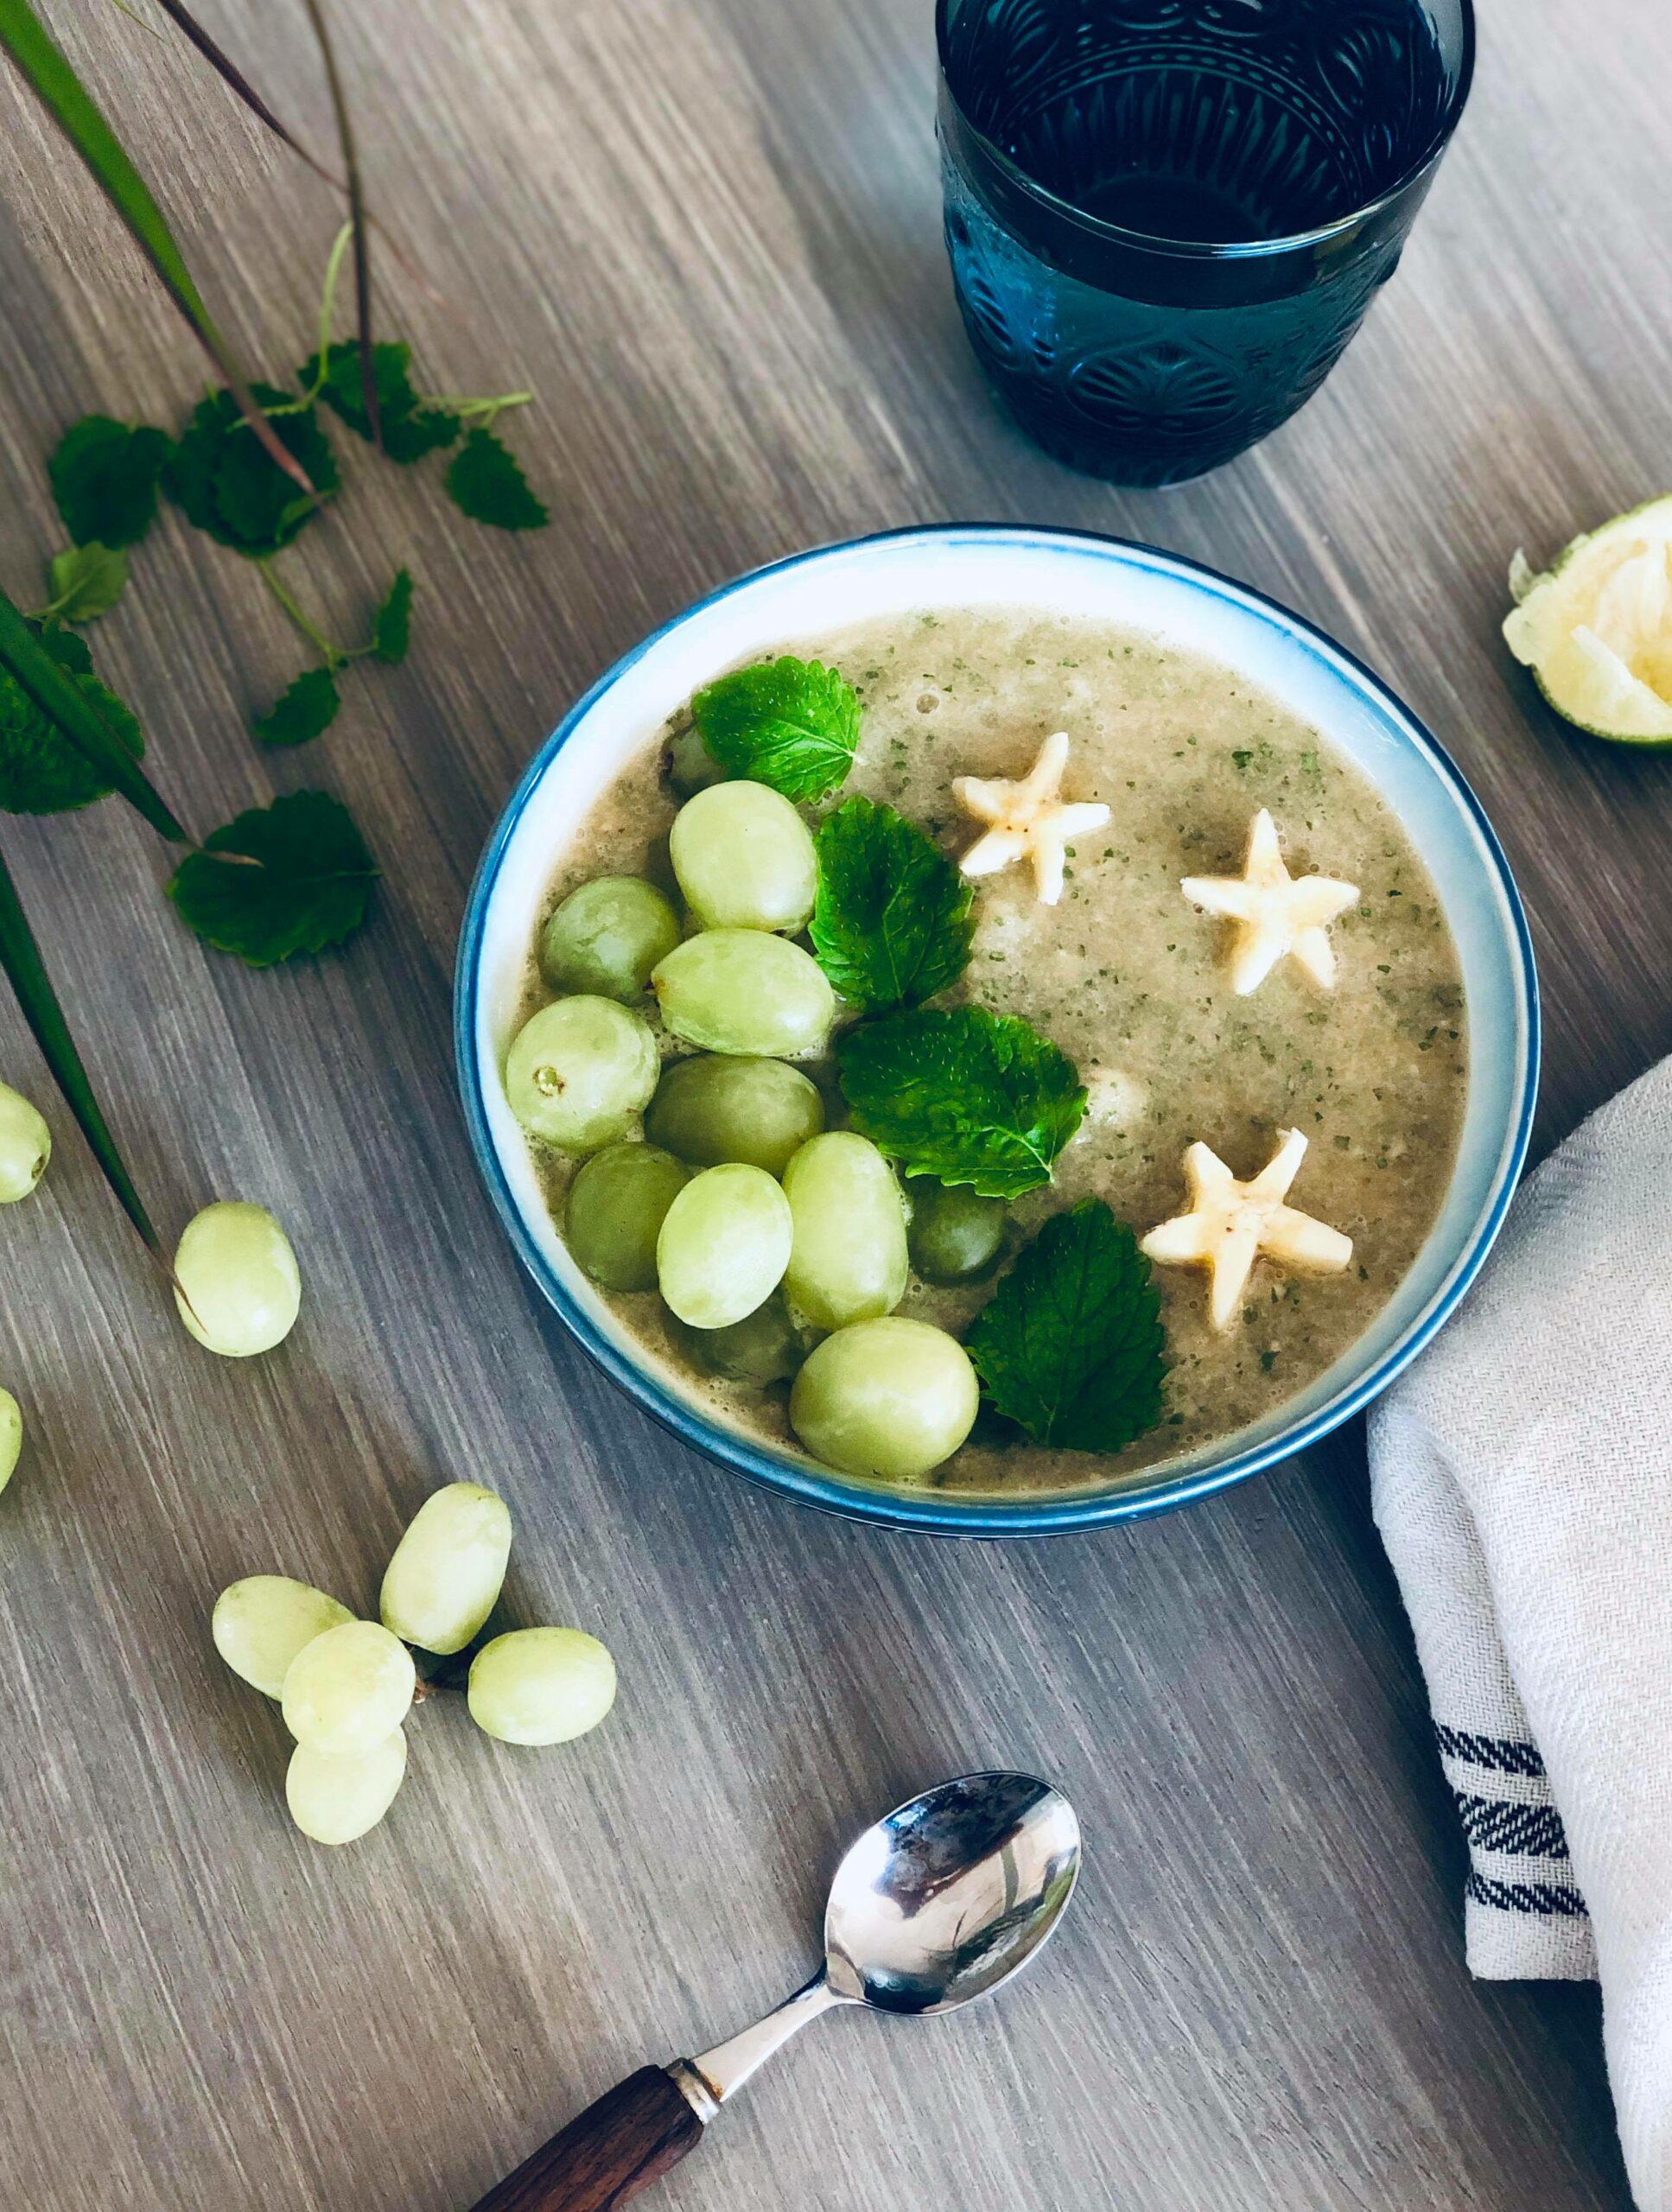 Smoothiebowl med cantaloupe, sitronmelisse, honning og druer